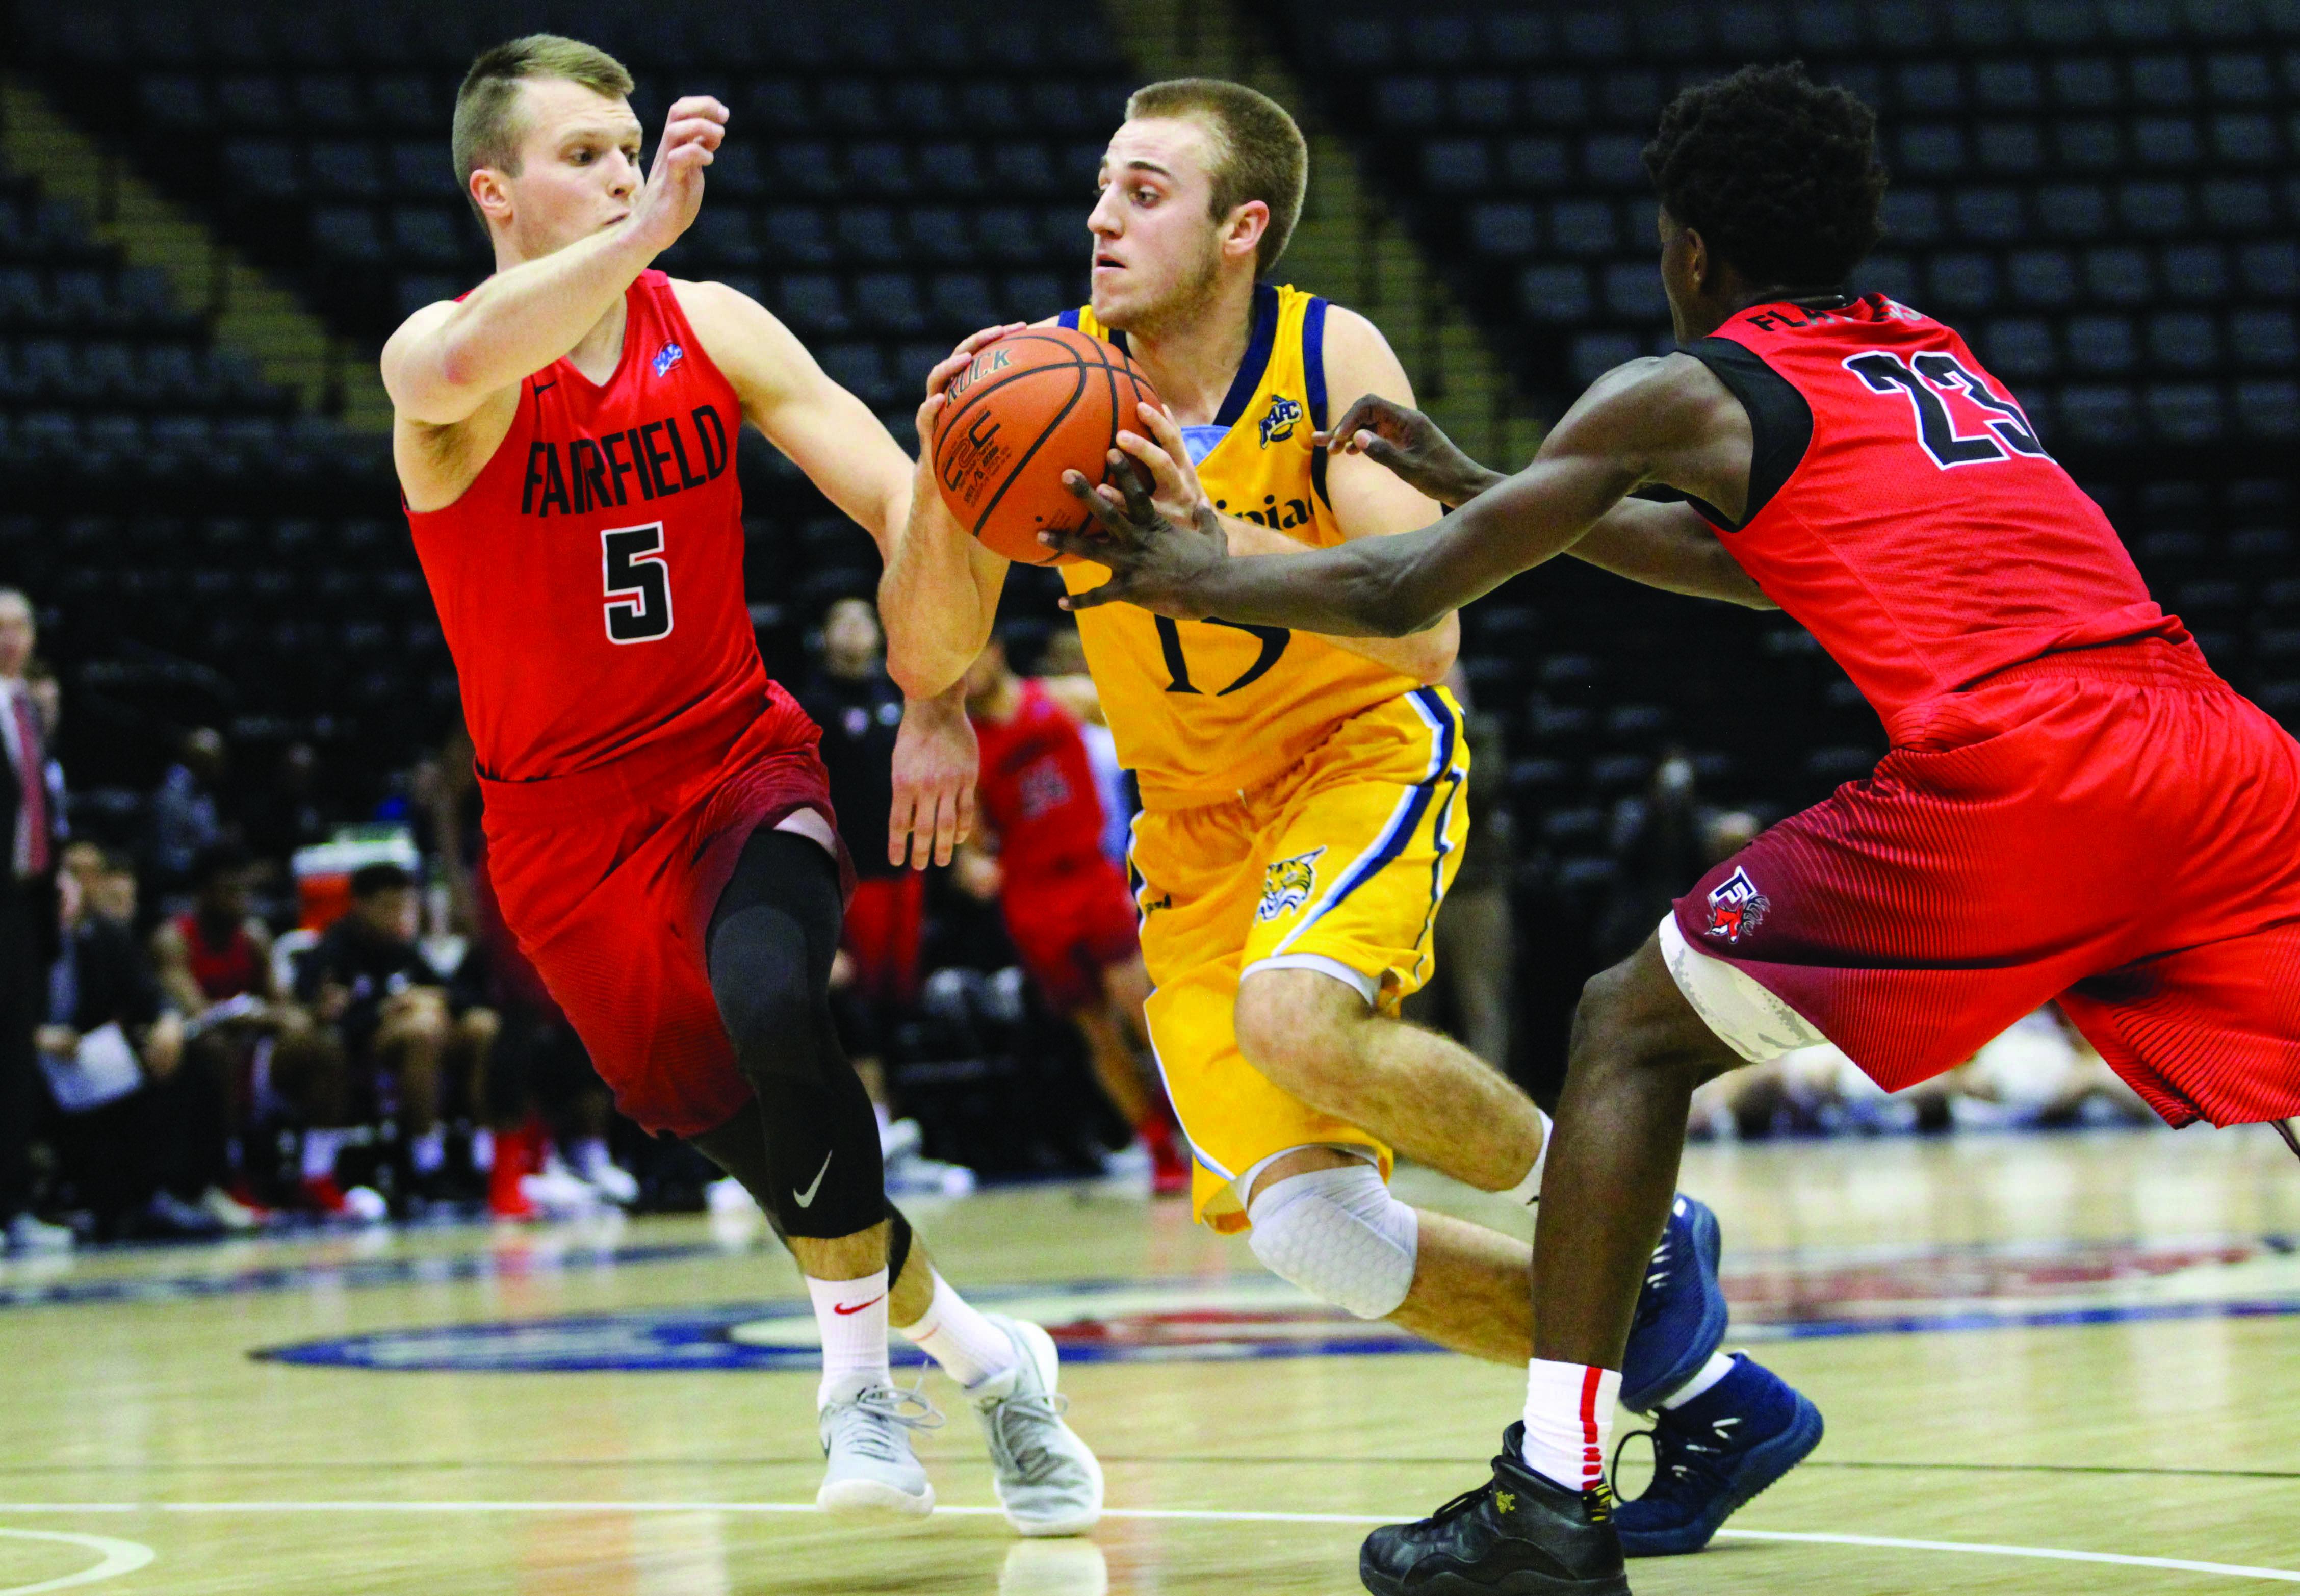 Quinnipiac men's basketball falls in double overtime at Fairfield